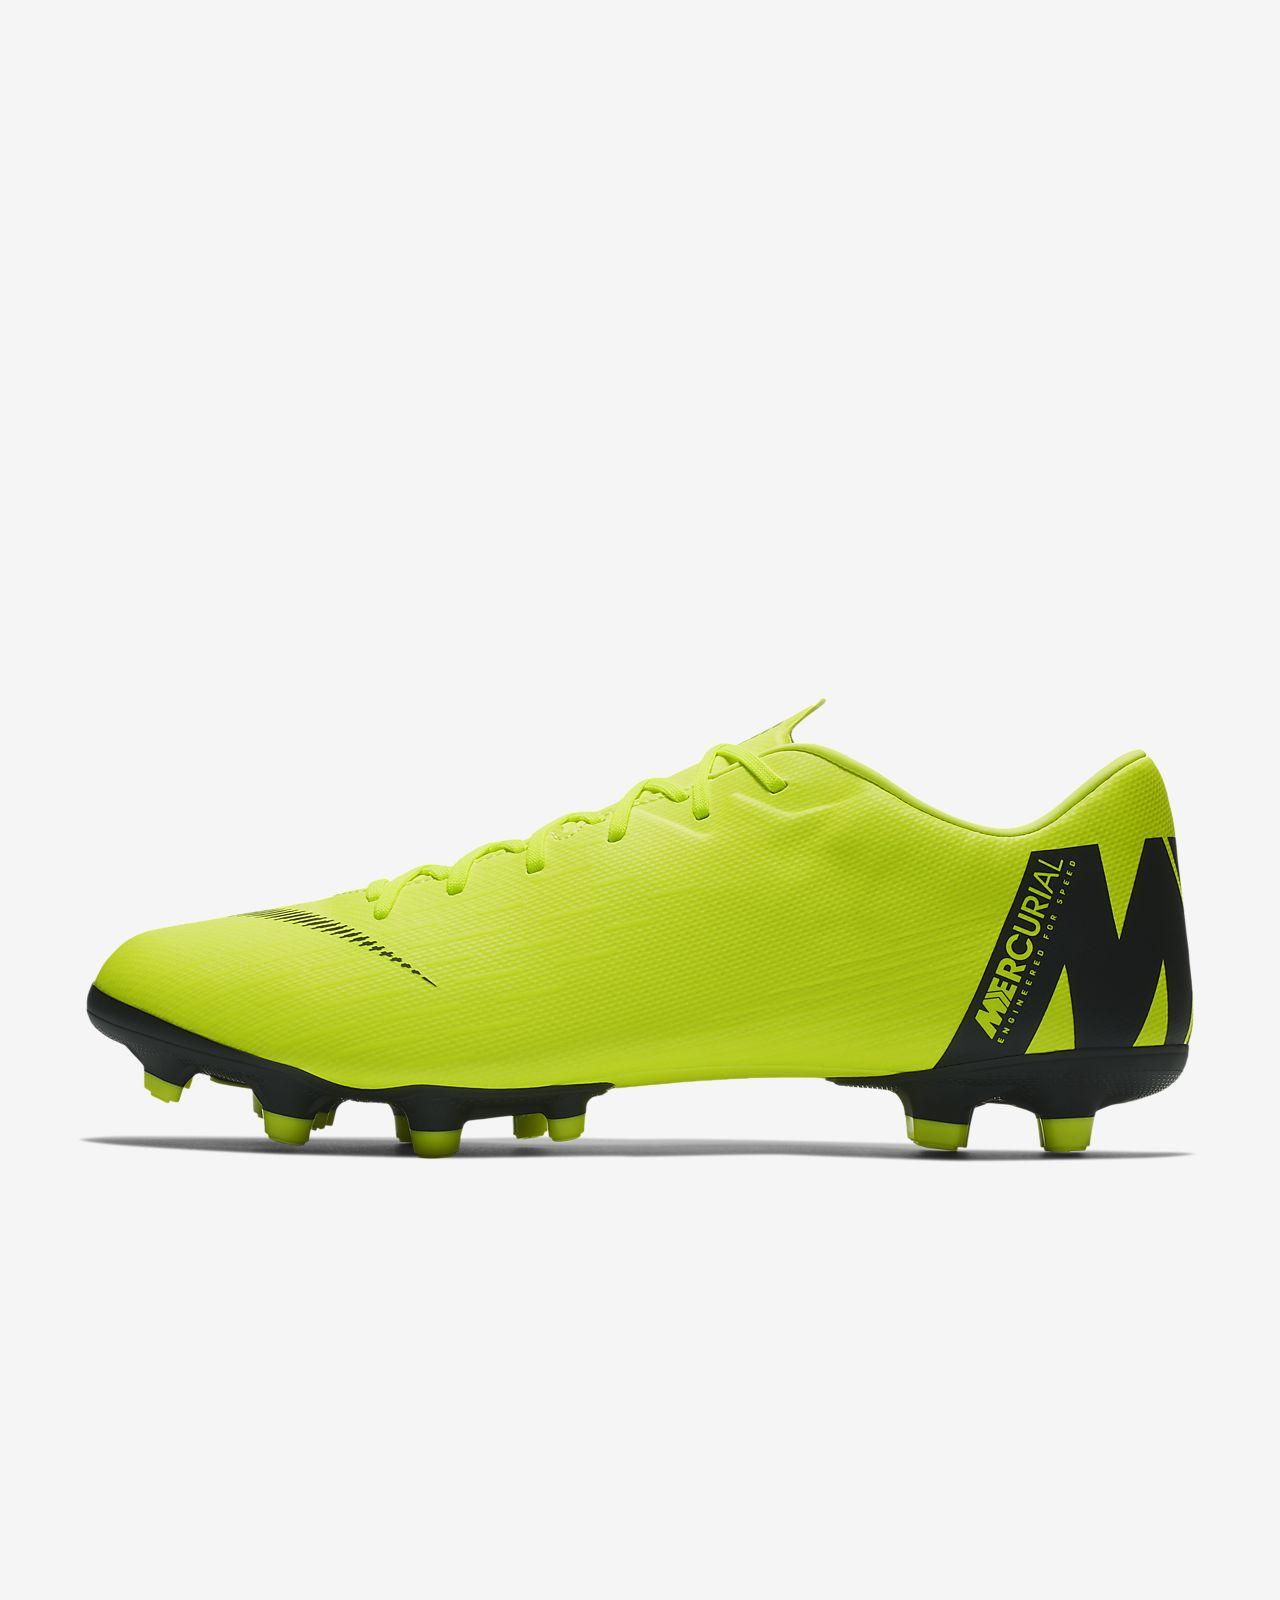 premium selection 9358a acdbe germany nike mercurial vapor xi fg gris verde negro 9400b 0d592  spain  calzado de fútbol multiterreno nike mercurial vapor xii academy a65e7 705d0